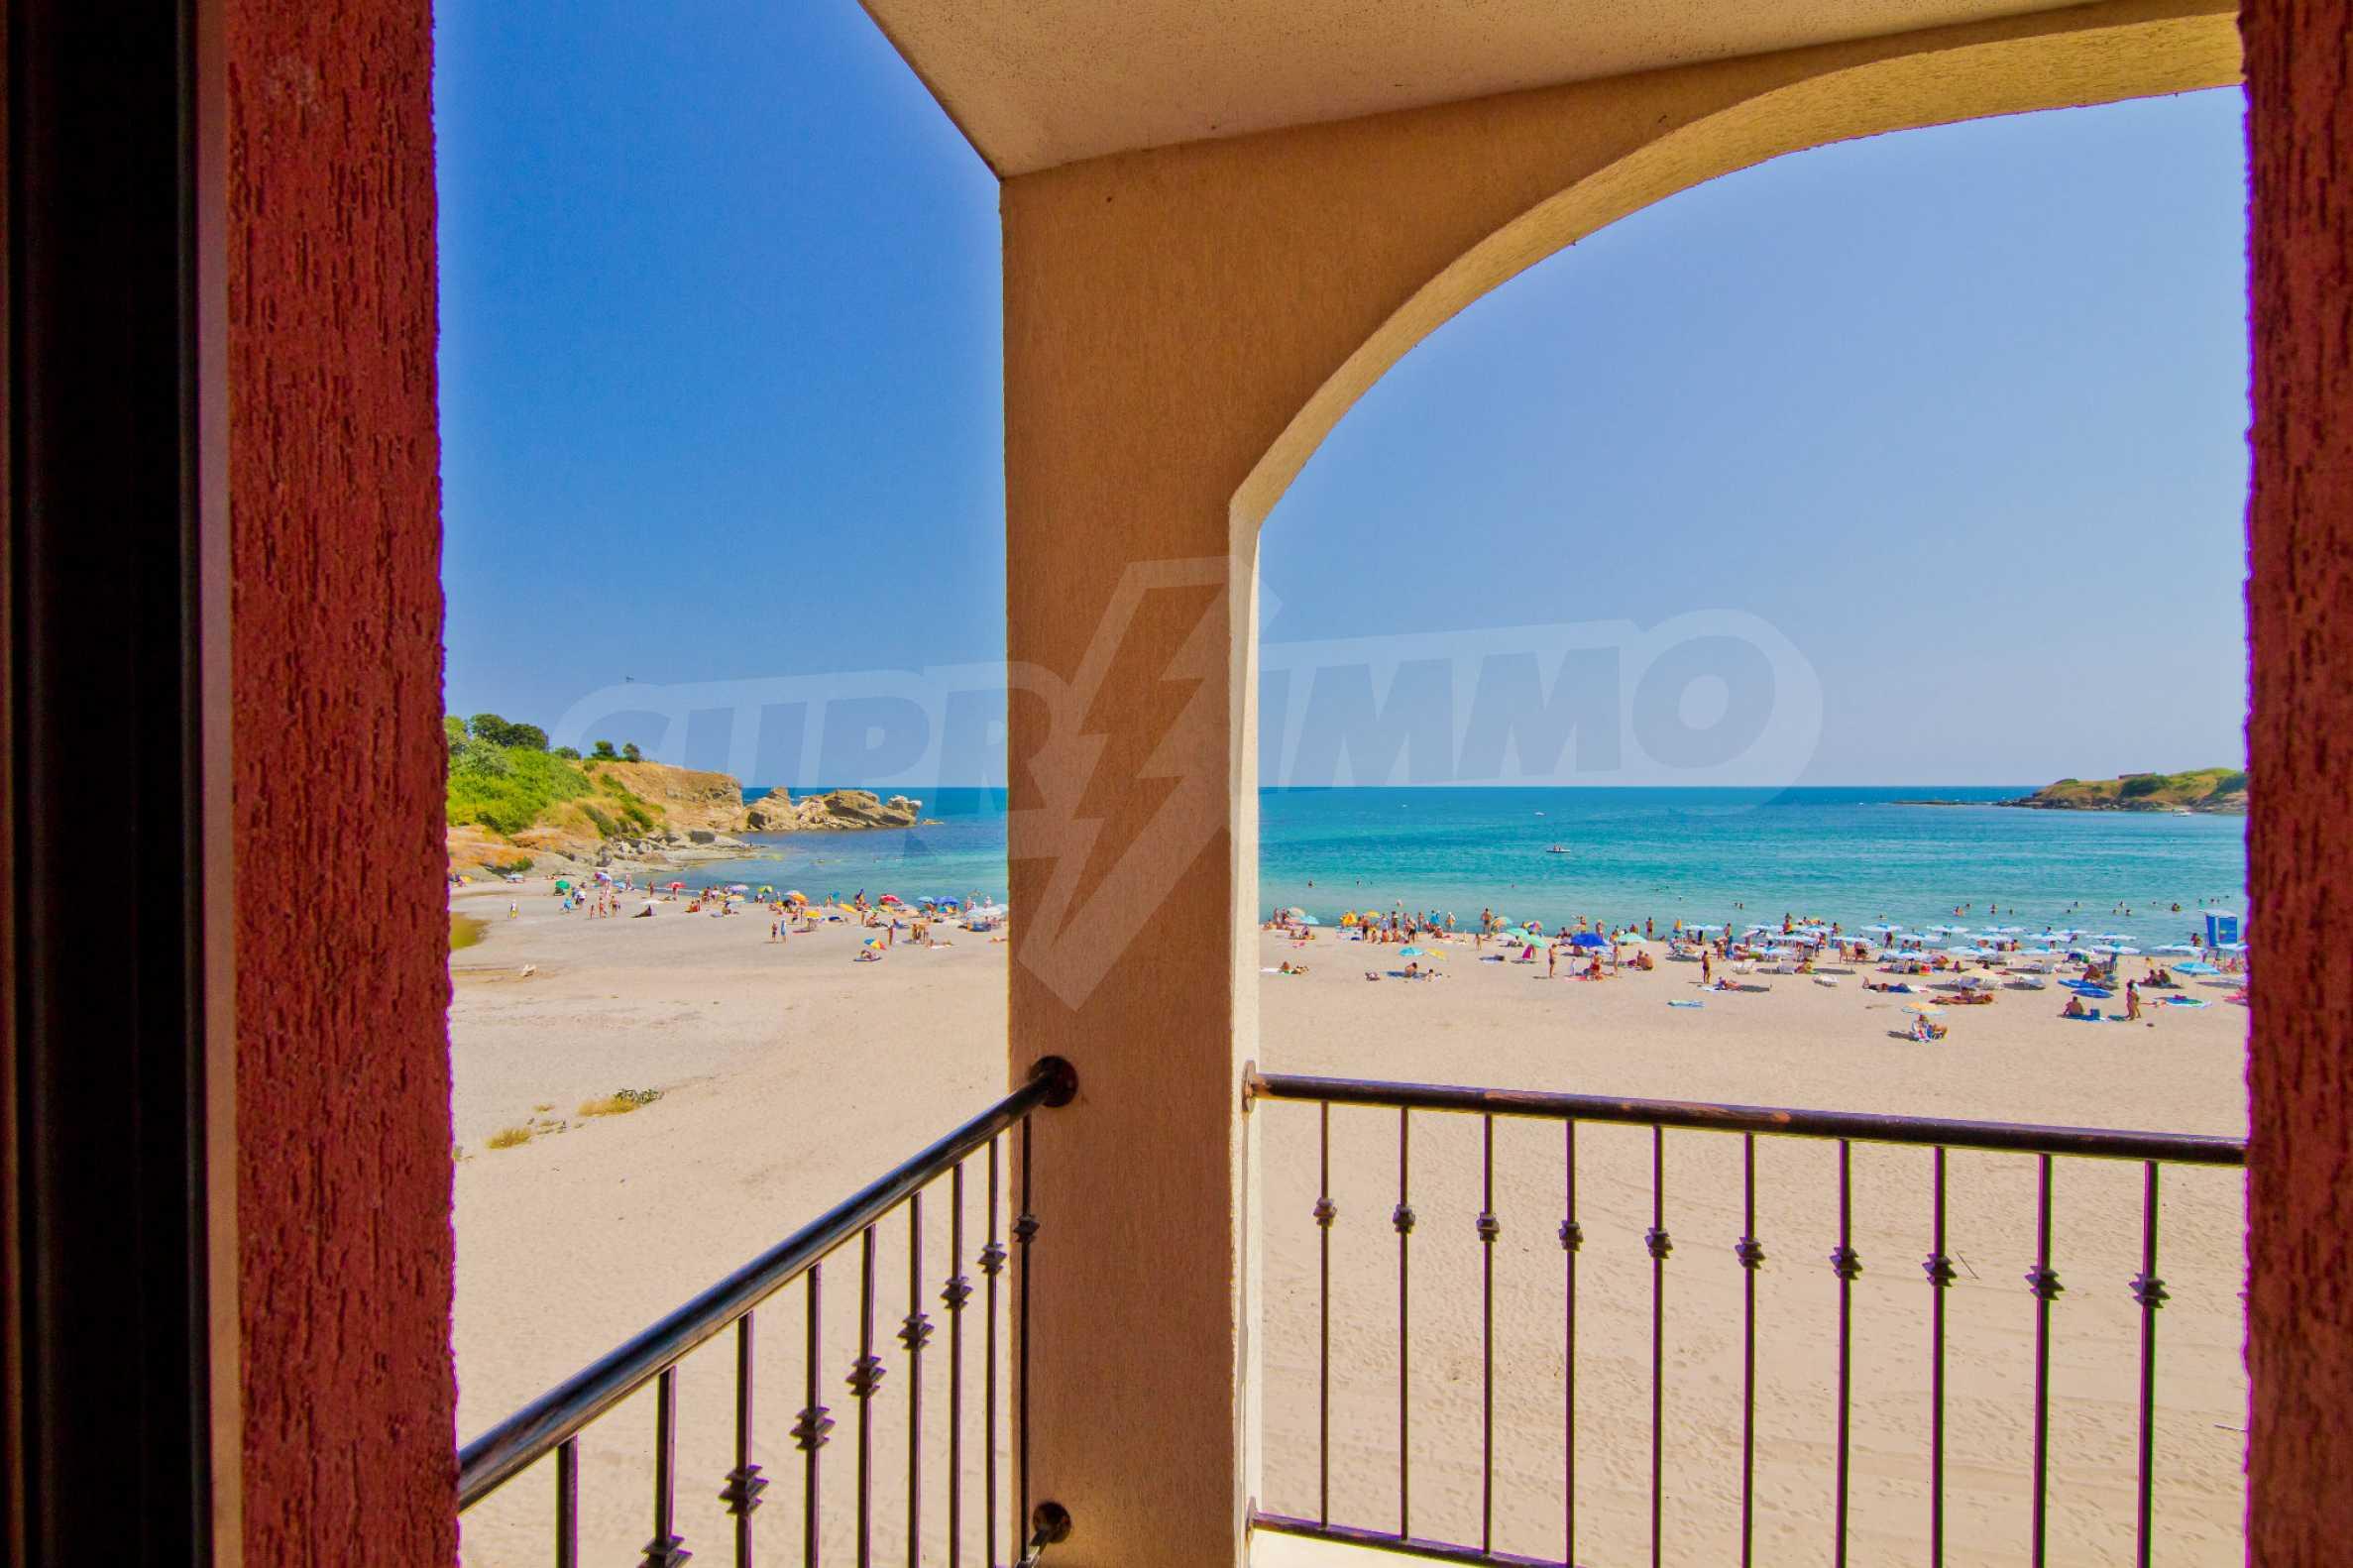 Примеа Бийч Резиденс / Primea Beach Residence 57